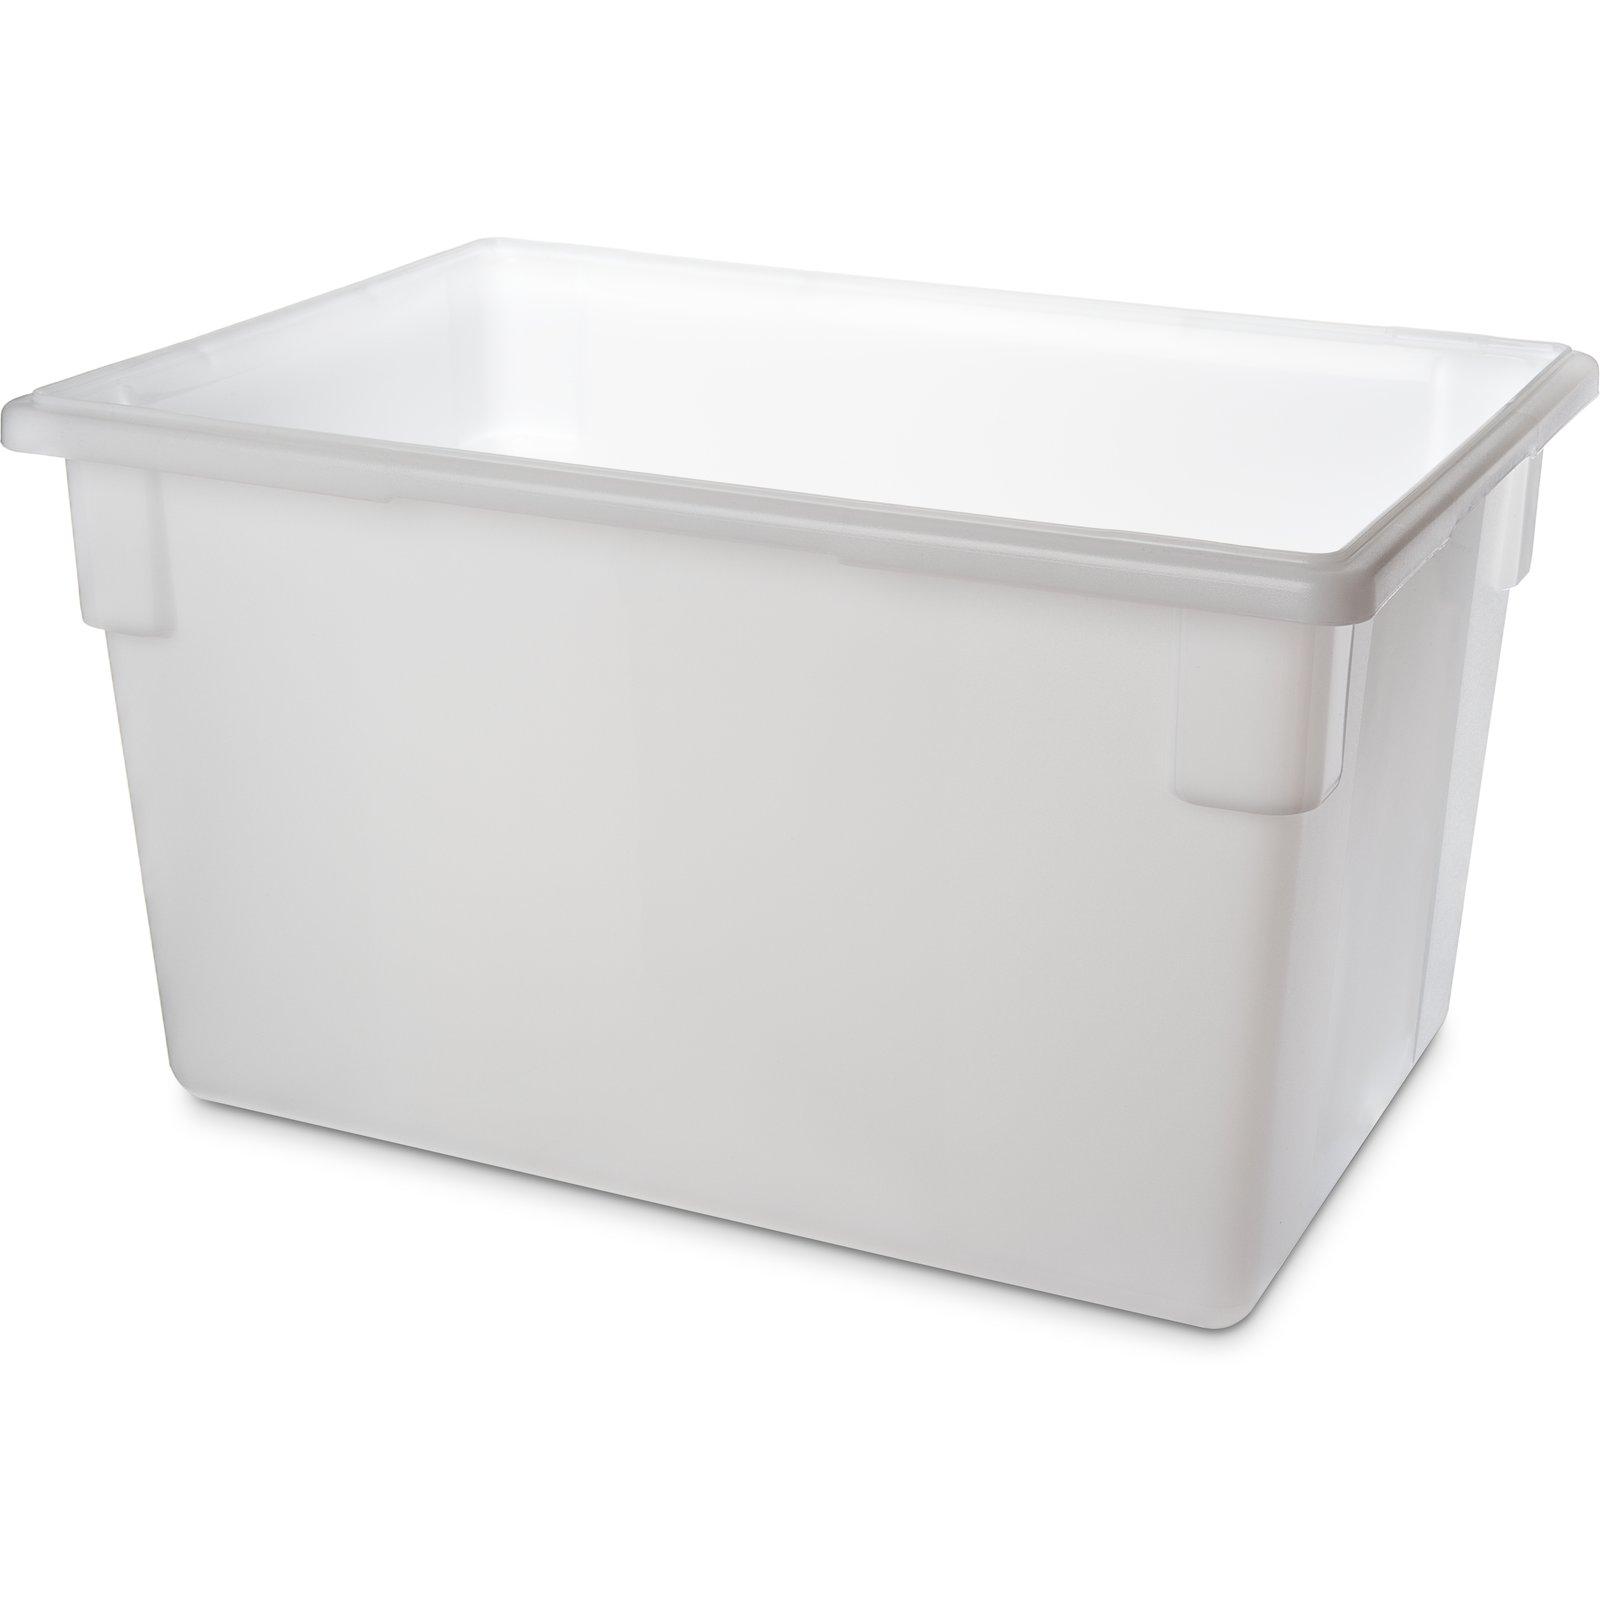 1064402 StorPlus Polyethylene Food Box Storage Container 215